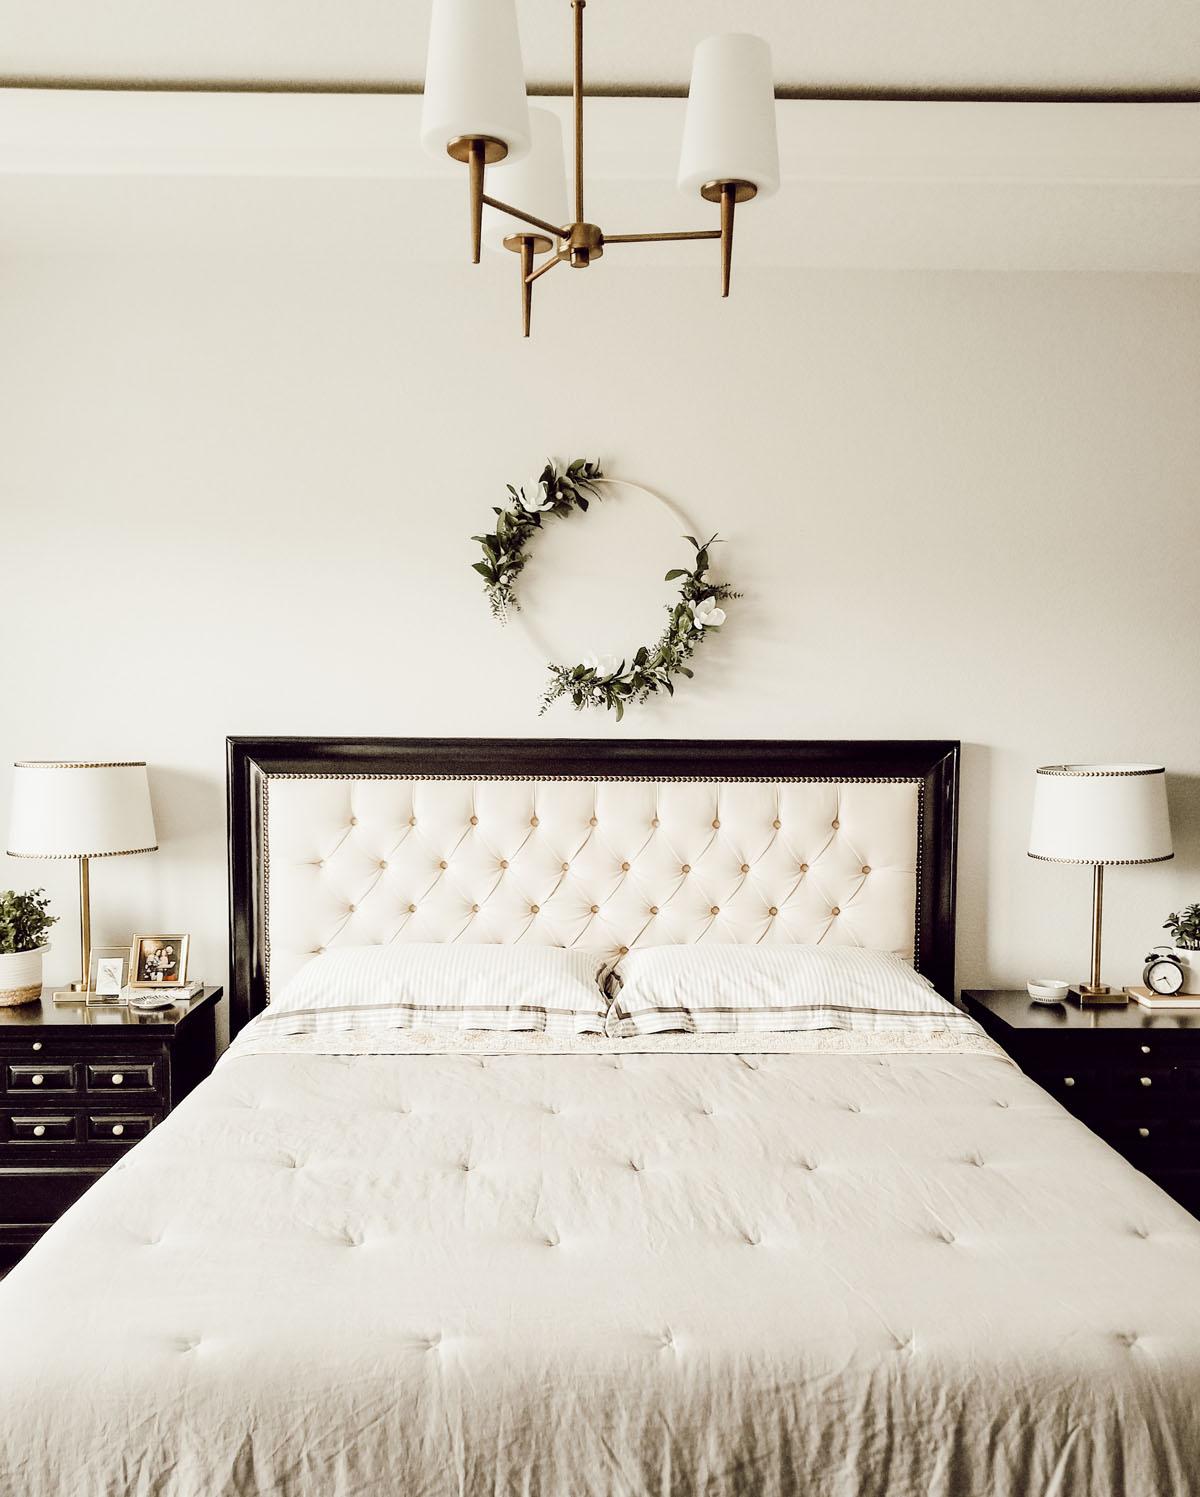 Vintage farmhouse bedroom decorating ideas